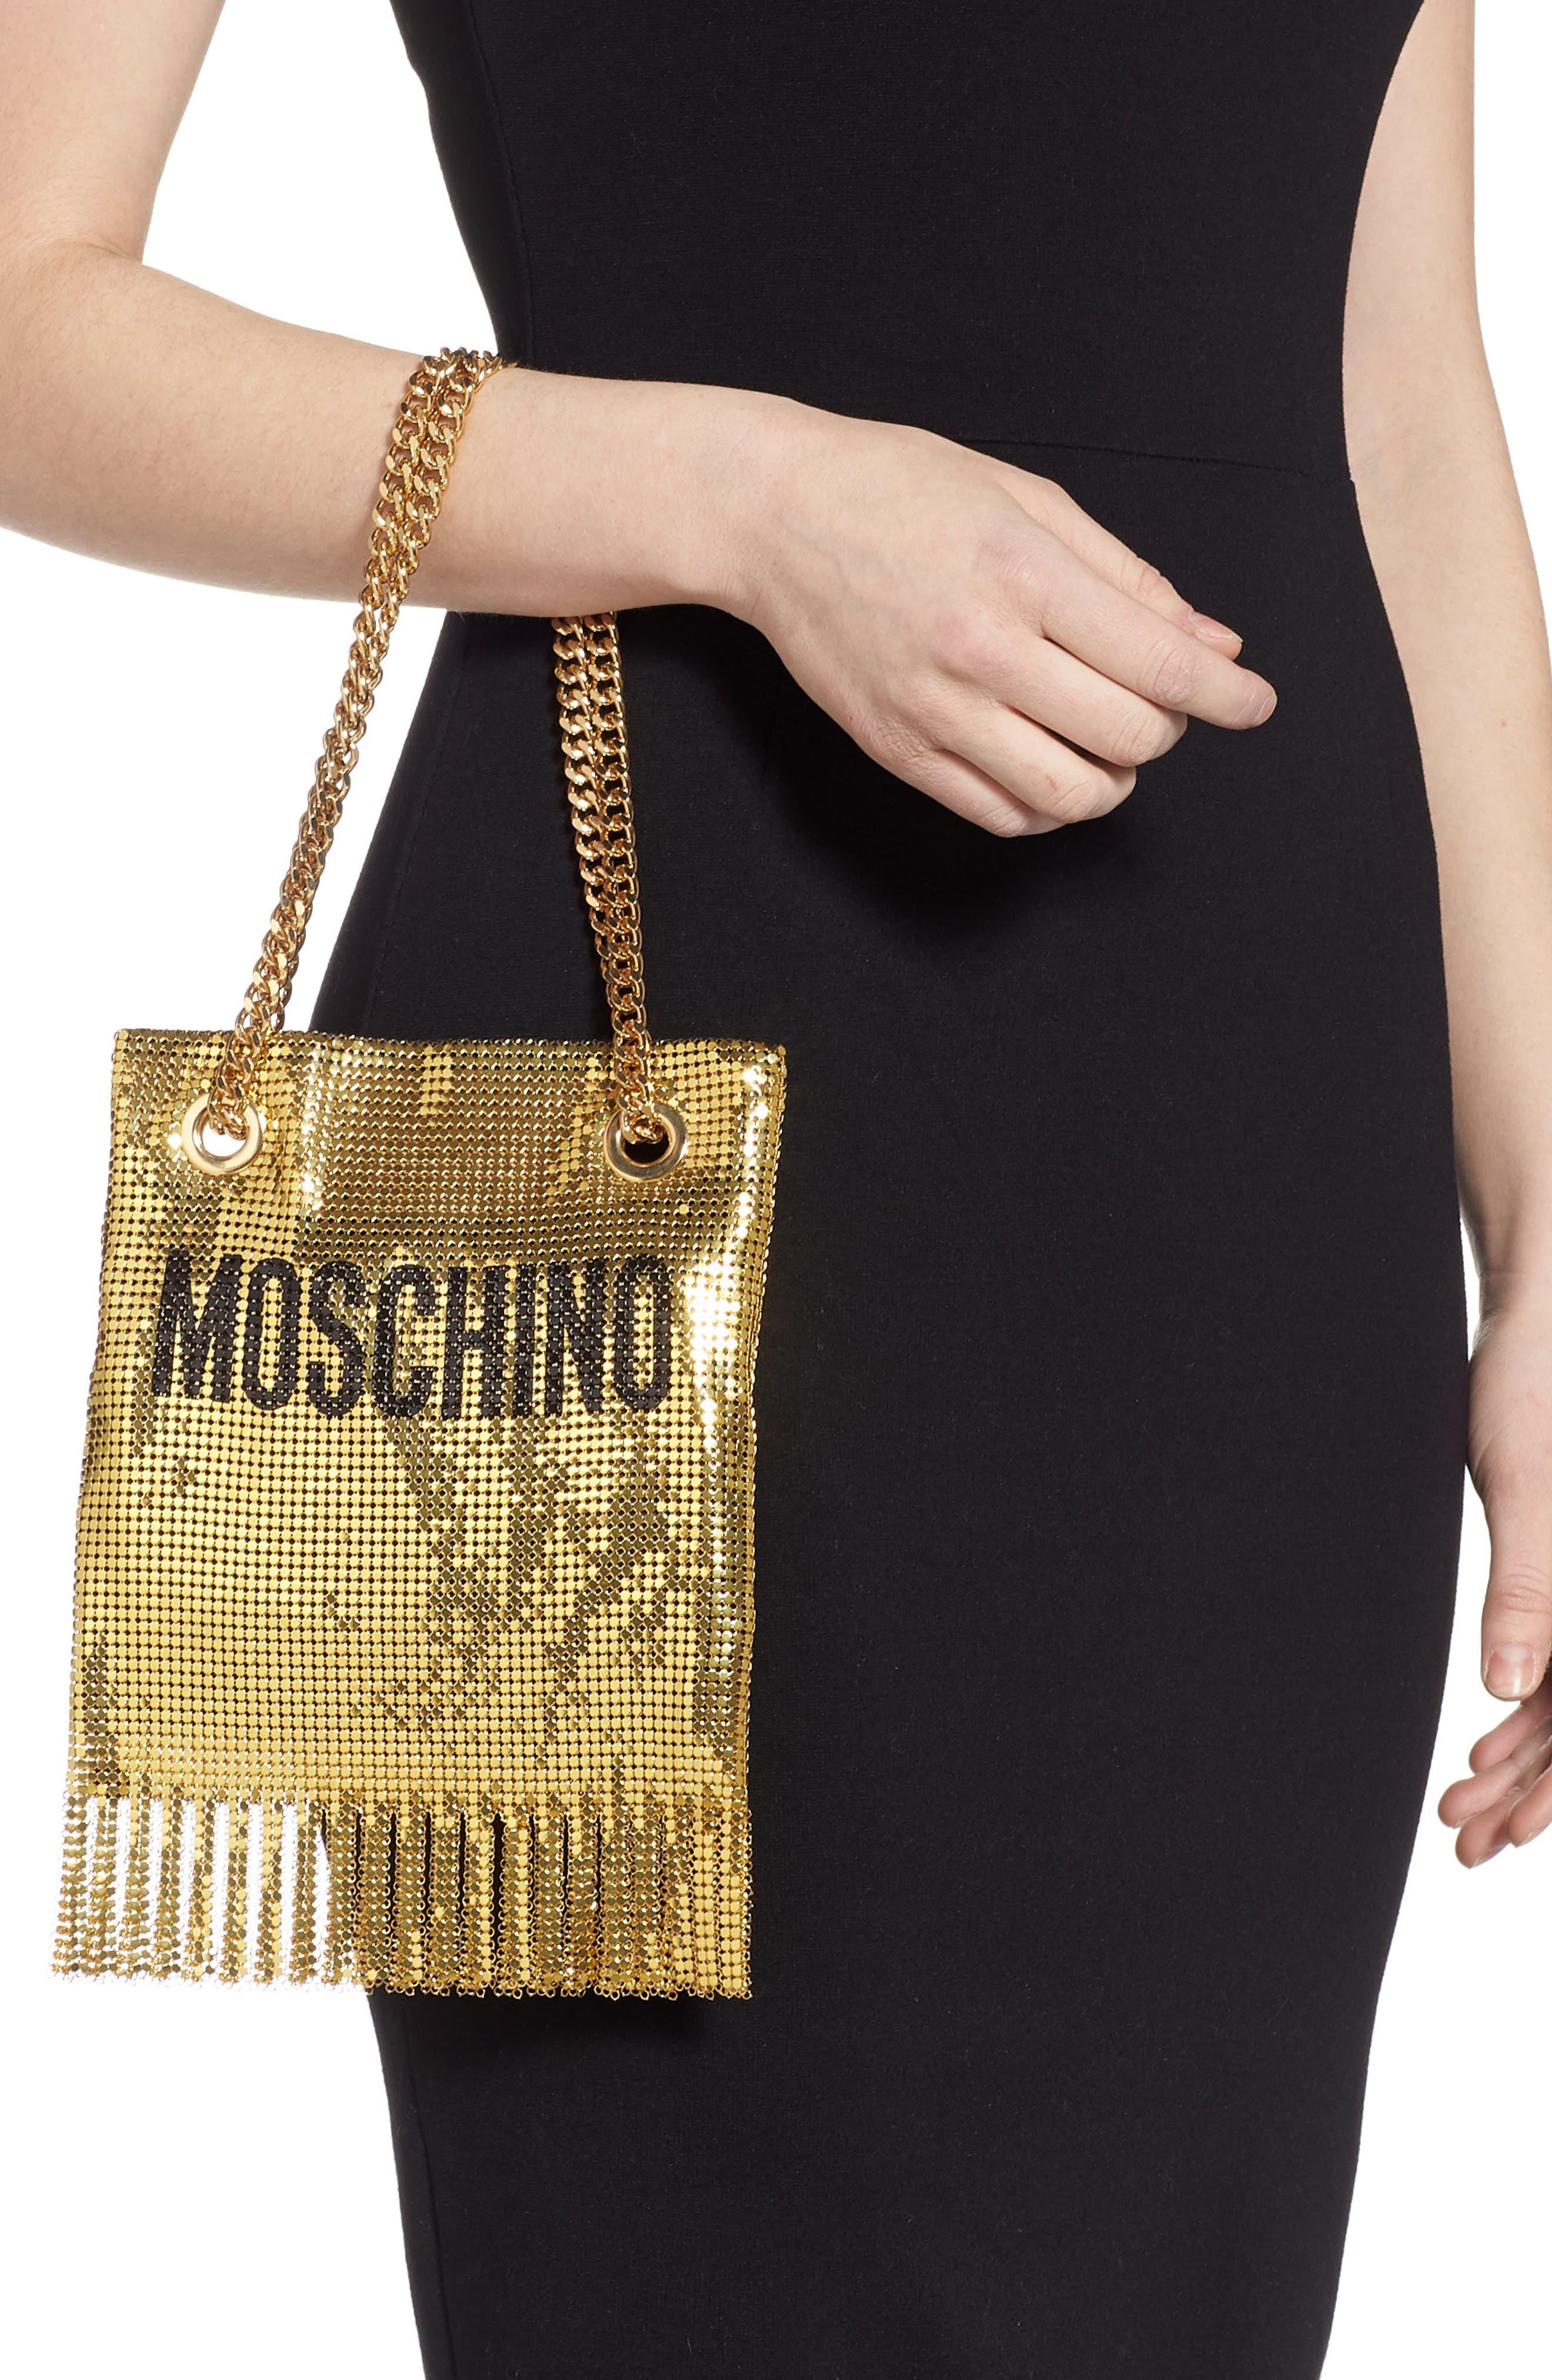 MOSCHINO, Logo Metallic Mesh Fringe Bag, Alternate thumbnail 2, color, GOLD